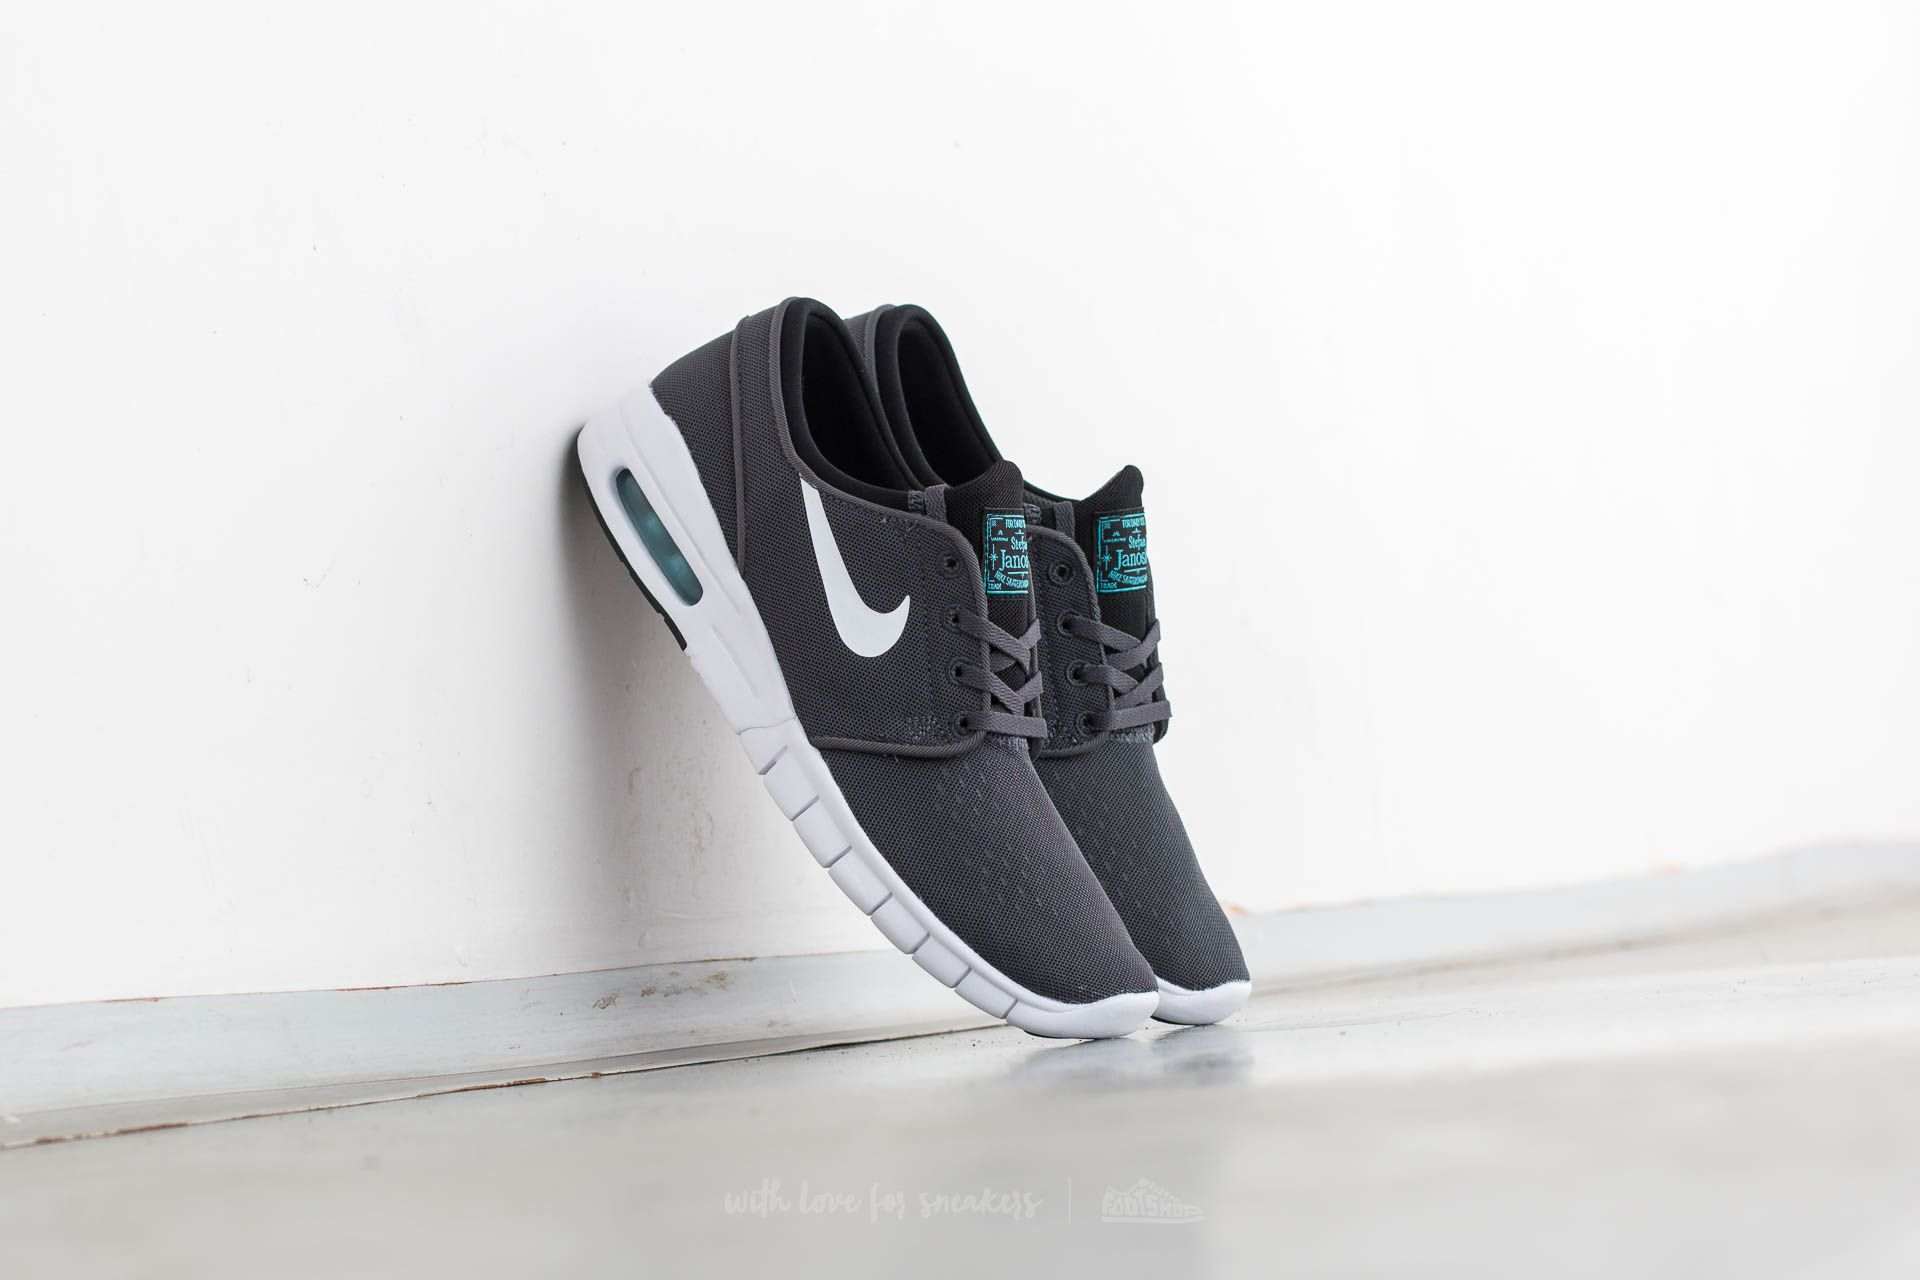 7a9107fb97 Nike Stefan Janoski Max Dark Grey/ White-Black-Gamma Blue ...